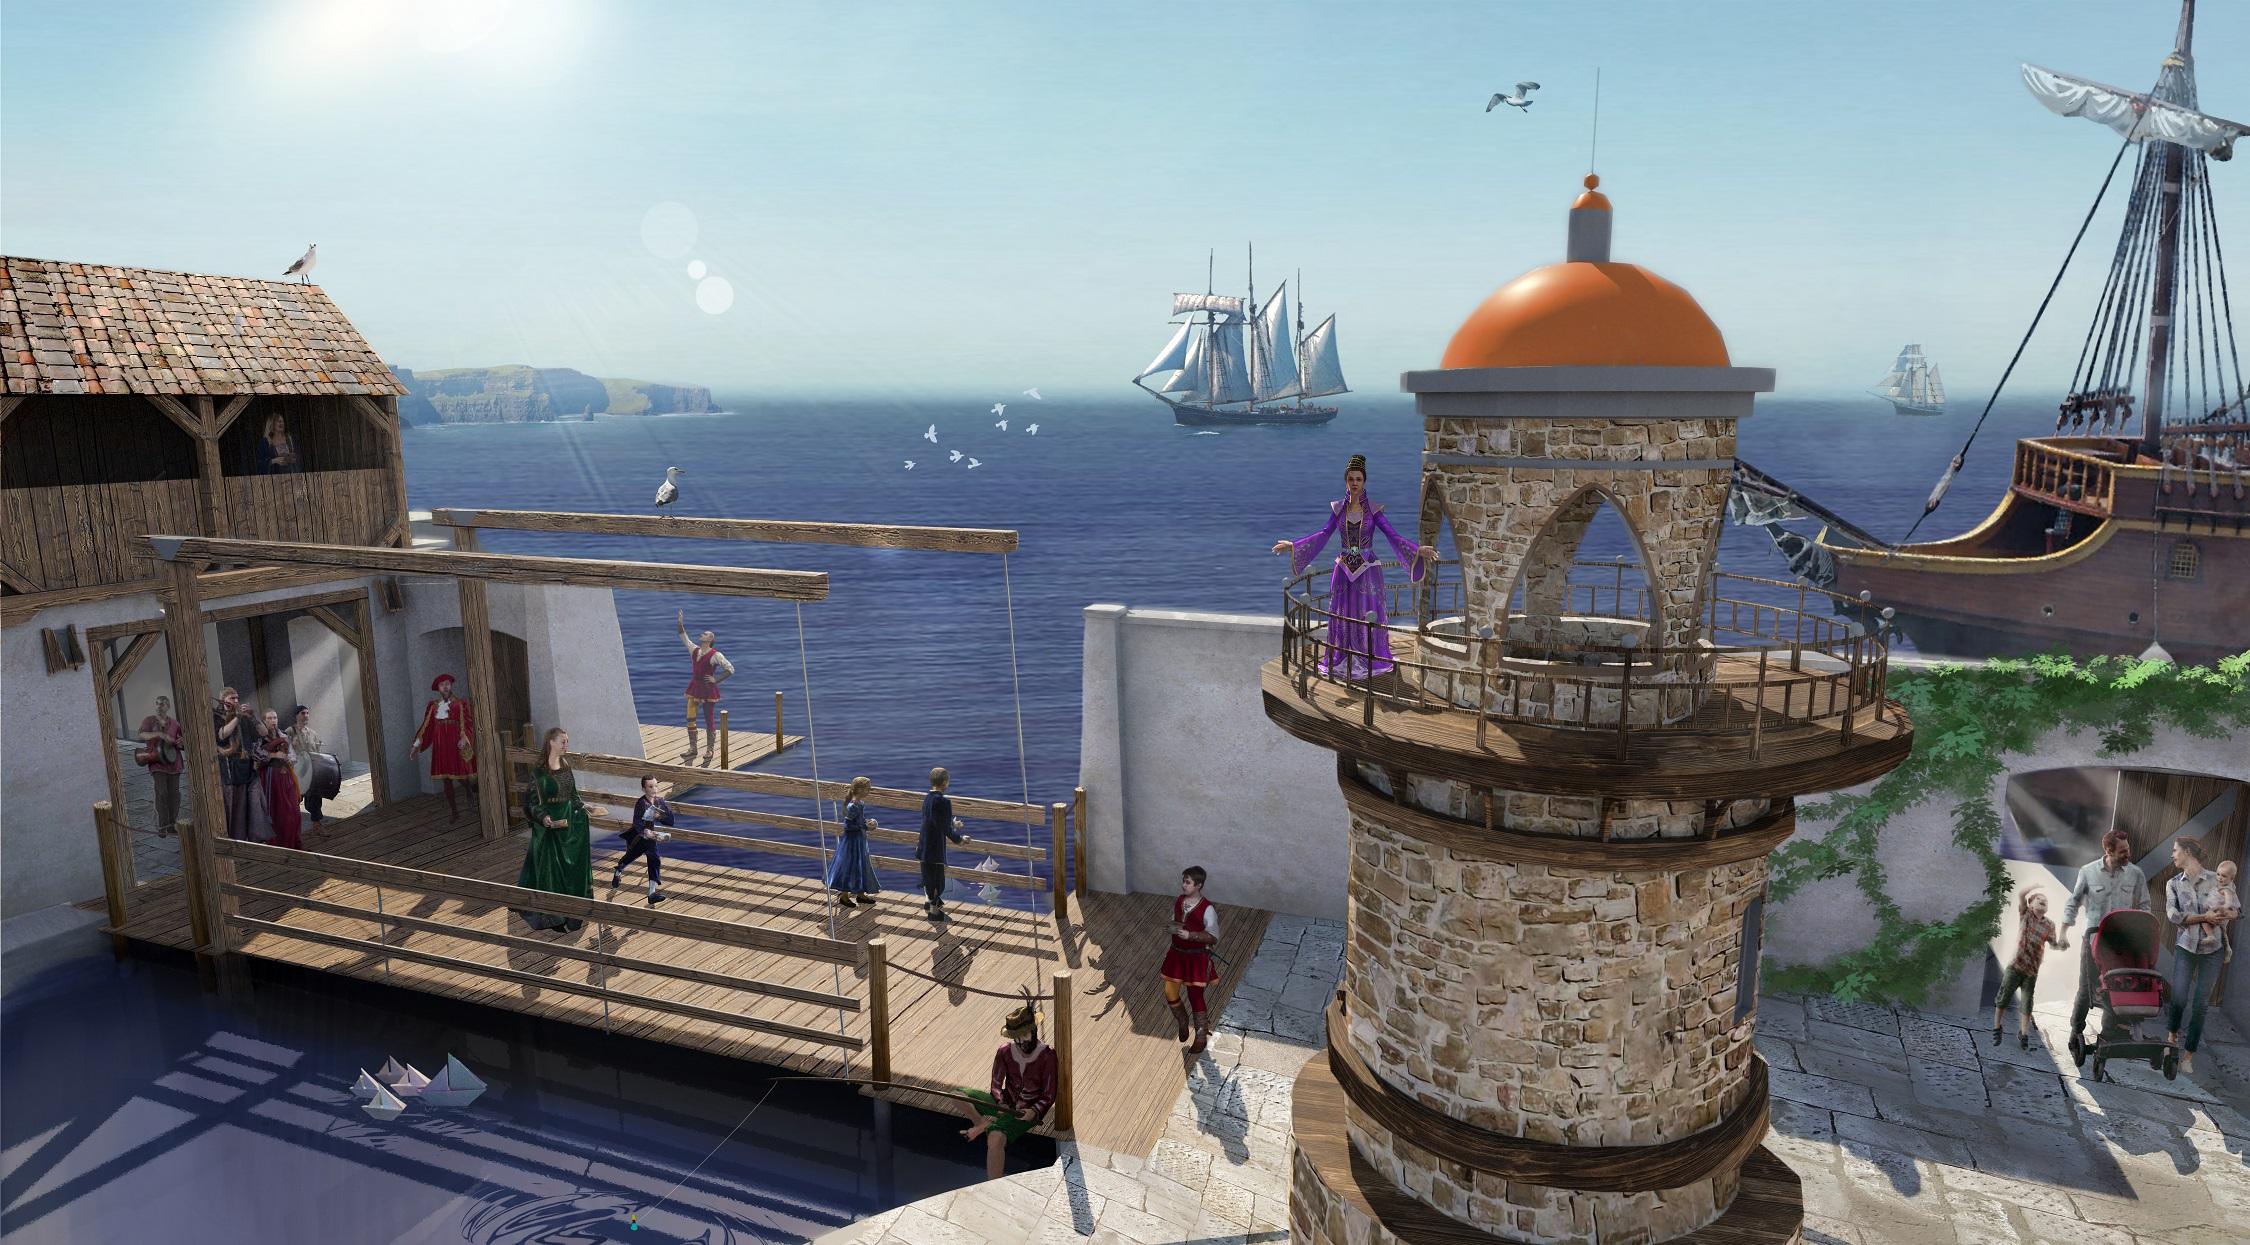 Lady Estelle podziwia Miasto Przygód (fot. Mandoria)